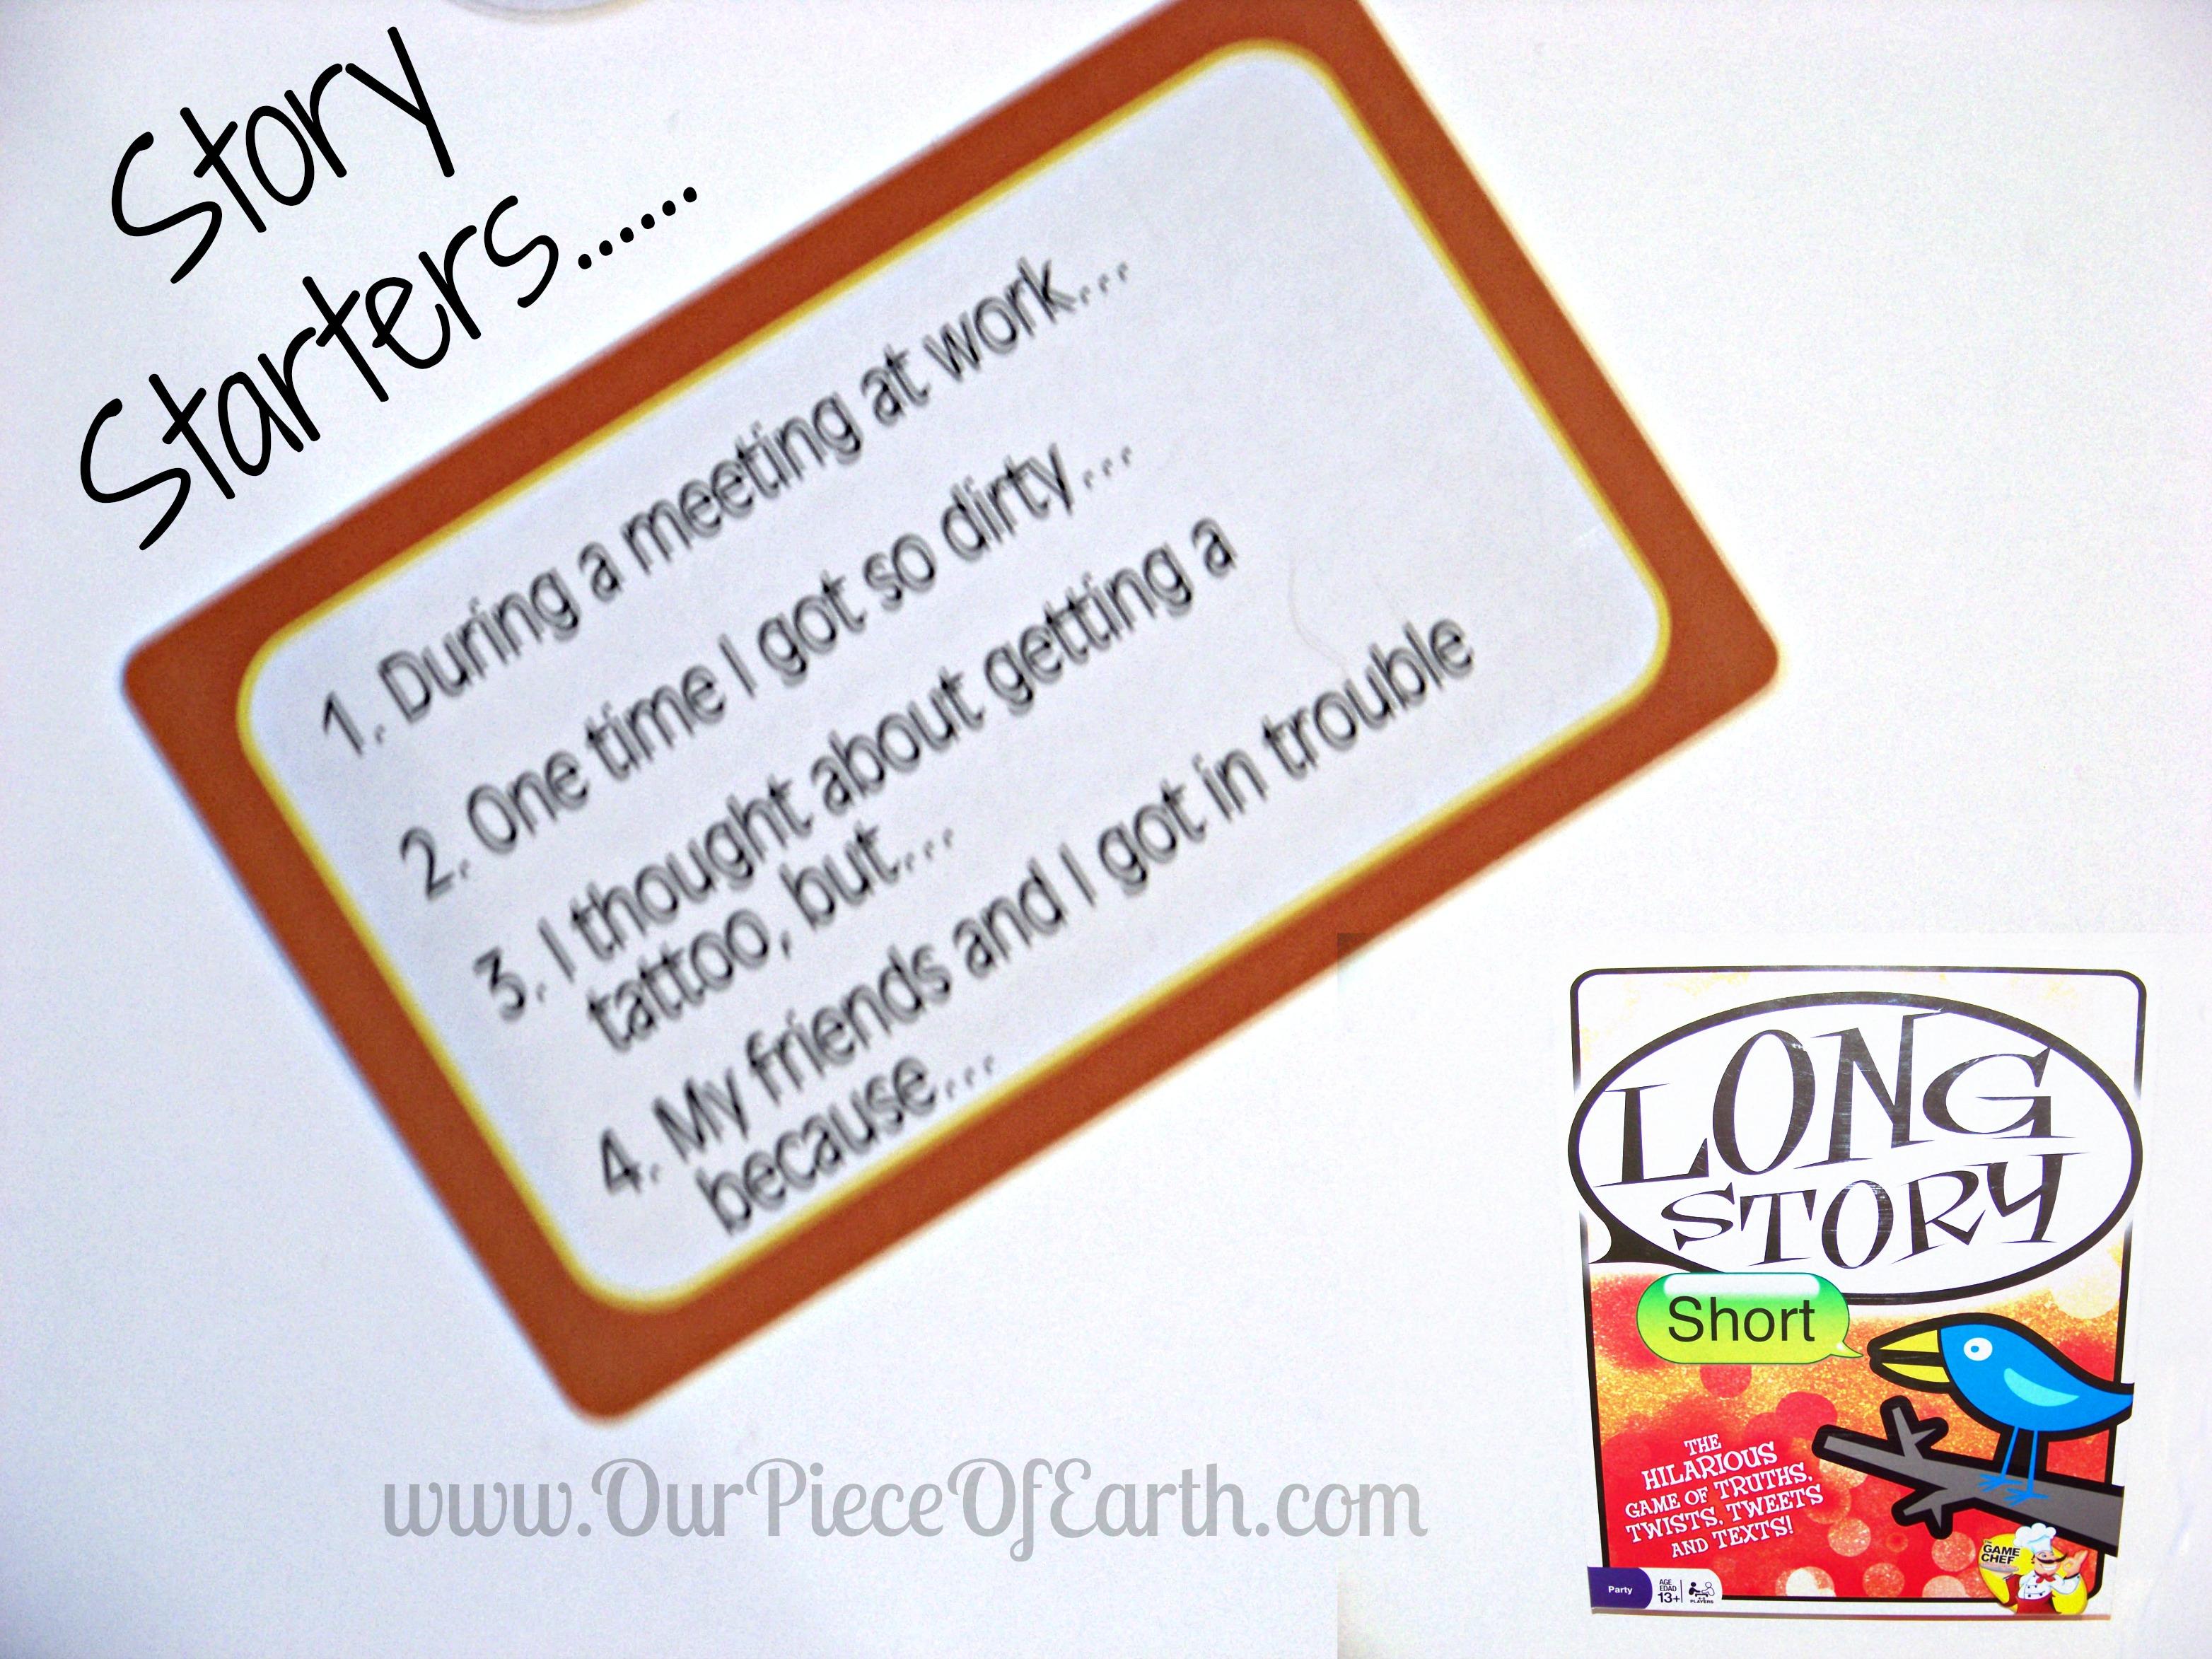 Affordable Long Story Short Family Game Night Meets Social Media Our Piece Earth Long Story Short Bermuda Long Story Short Idiom inspiration Long Story Short